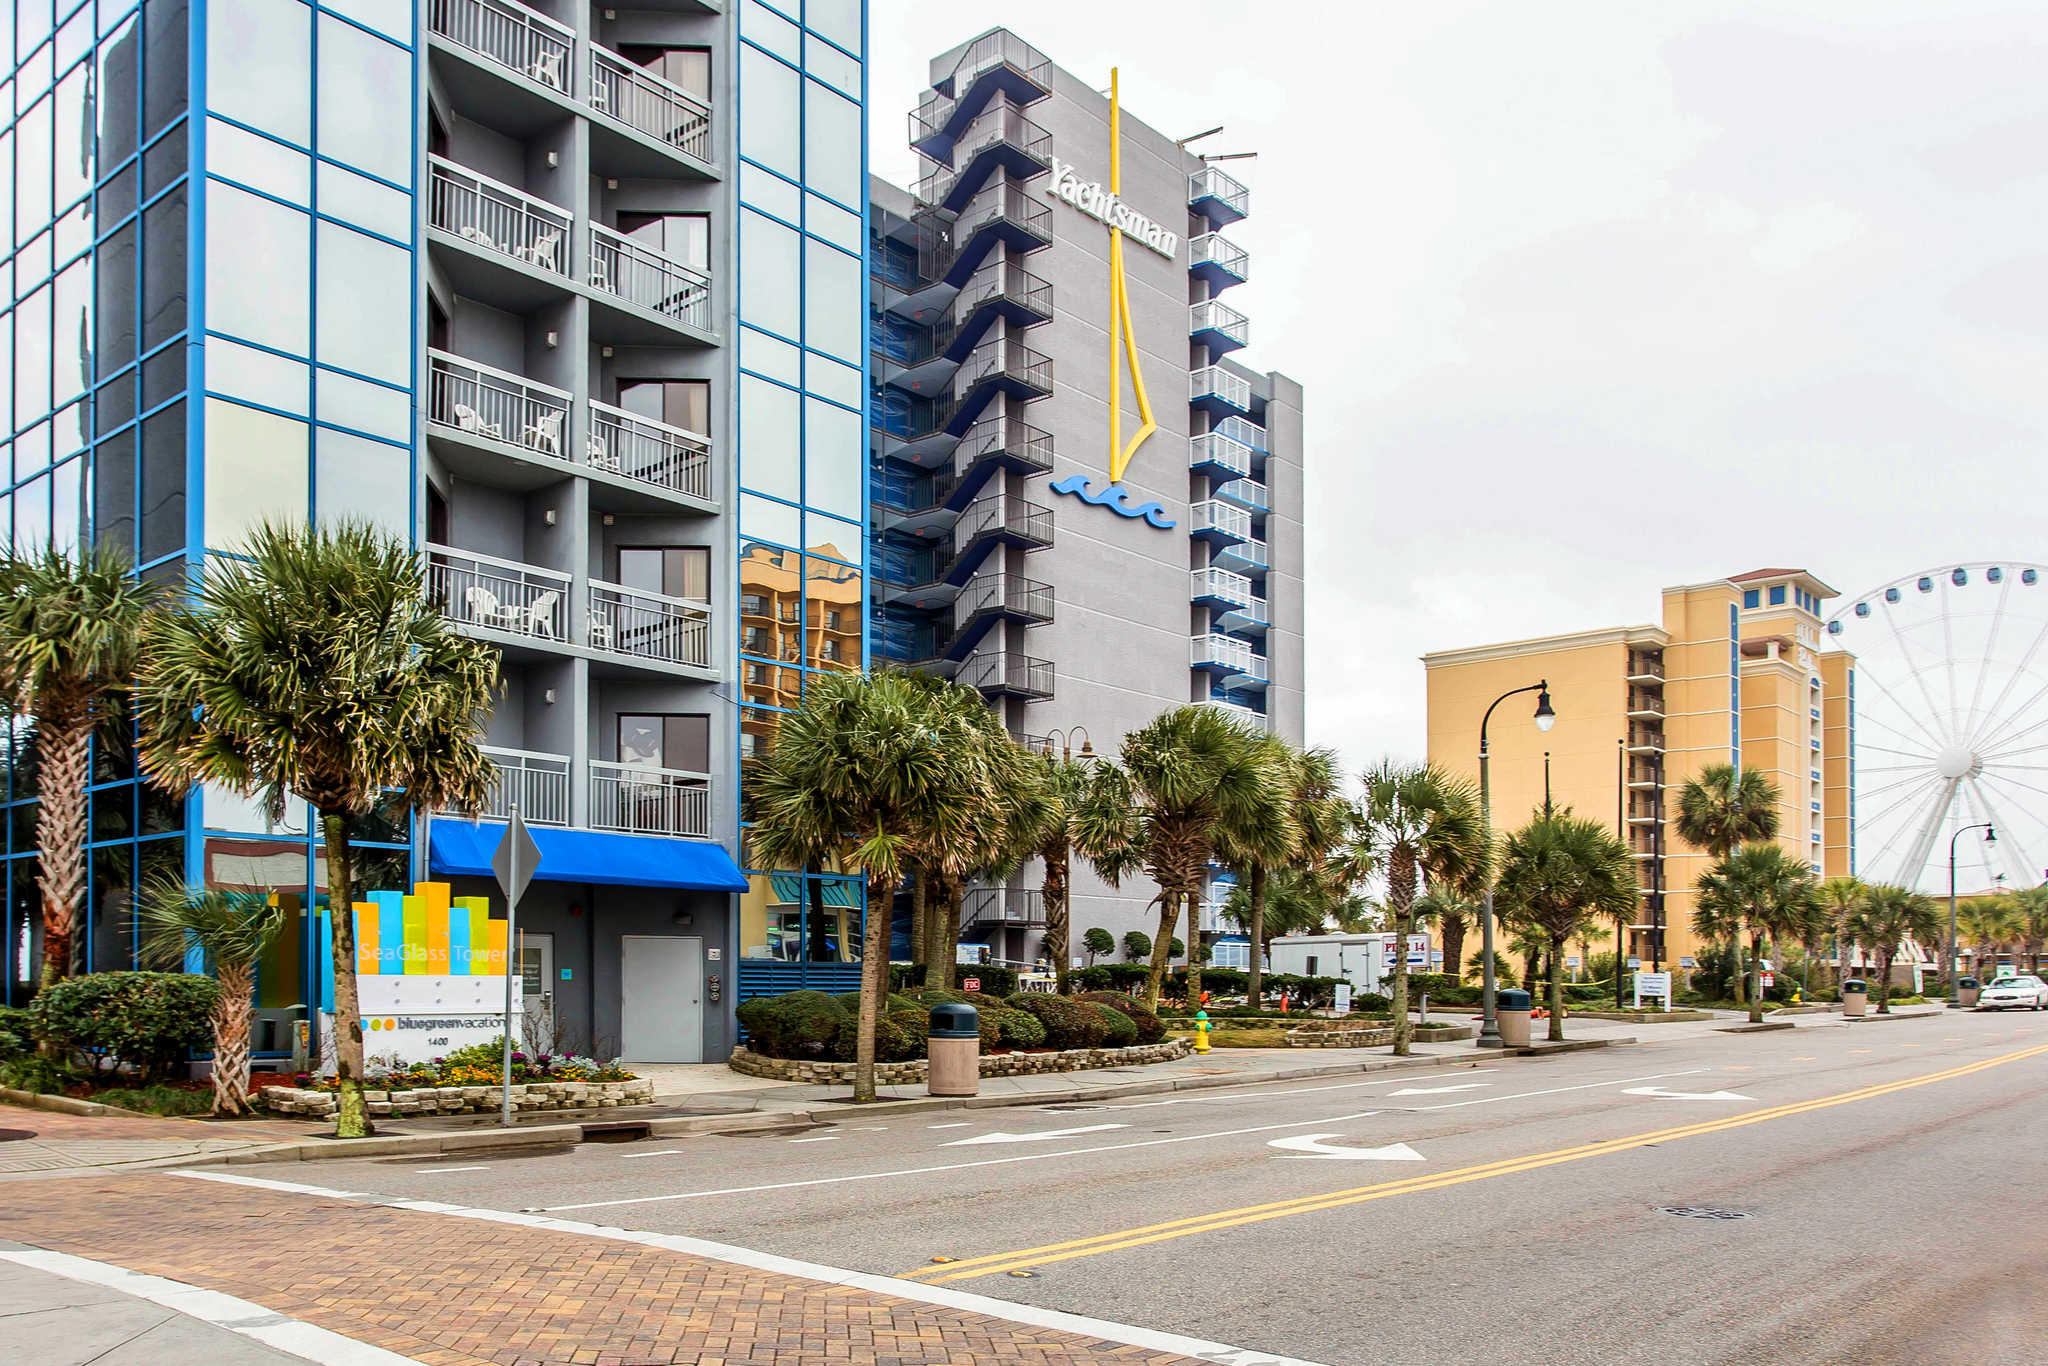 Myrtle Beach Hotels Resorts Motels Vacation Rentals